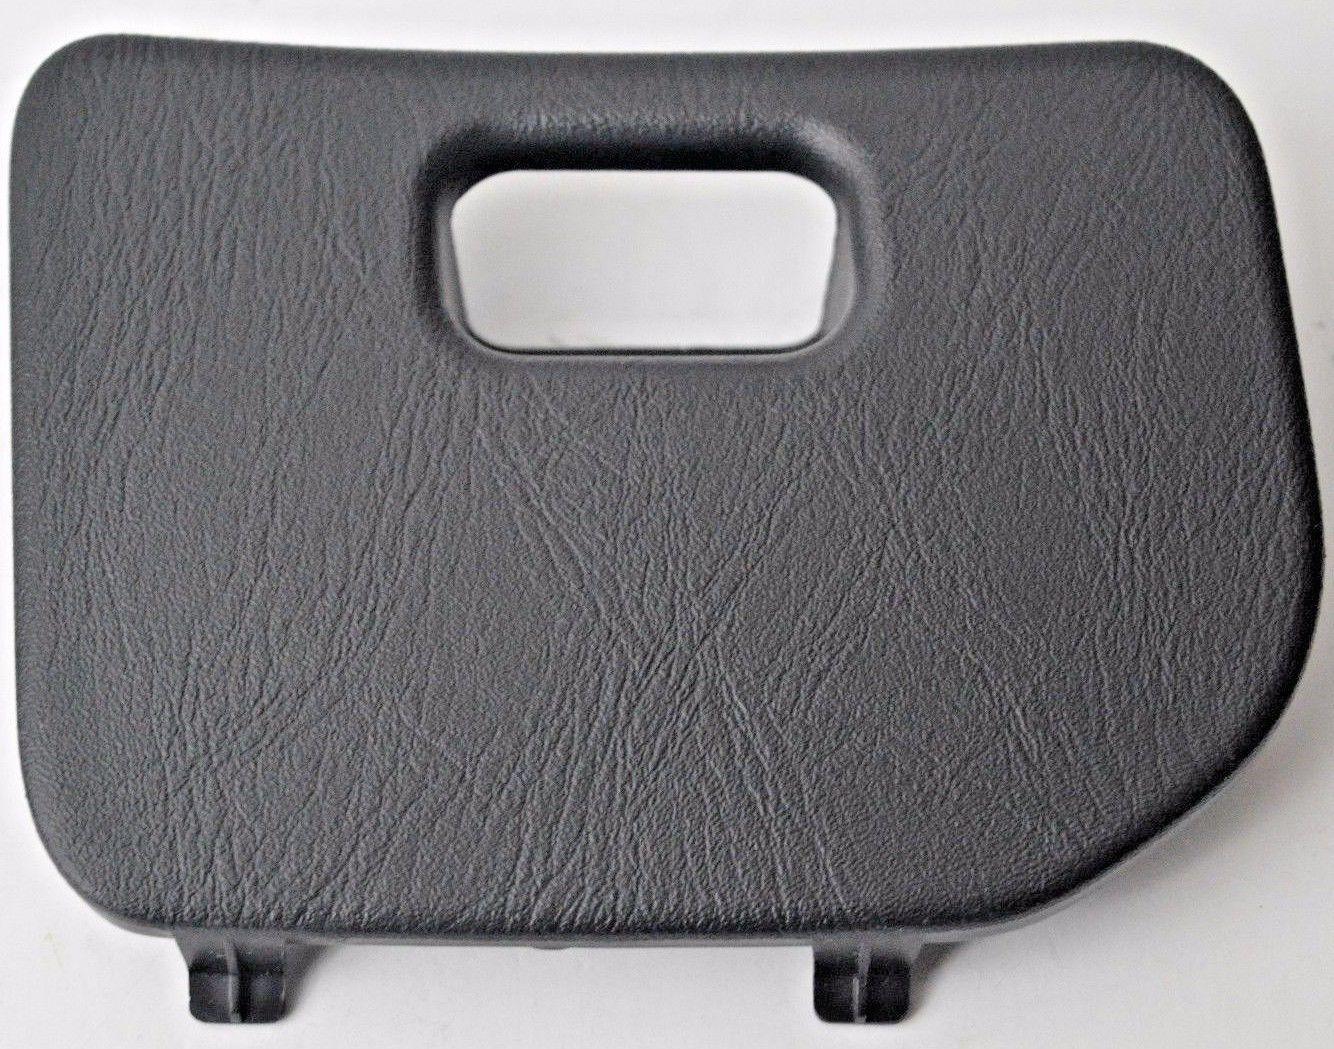 S l1600. S l1600. 00 01 02 03 2000-03 Nissan Maxima Black Fuse Block Cover  ...